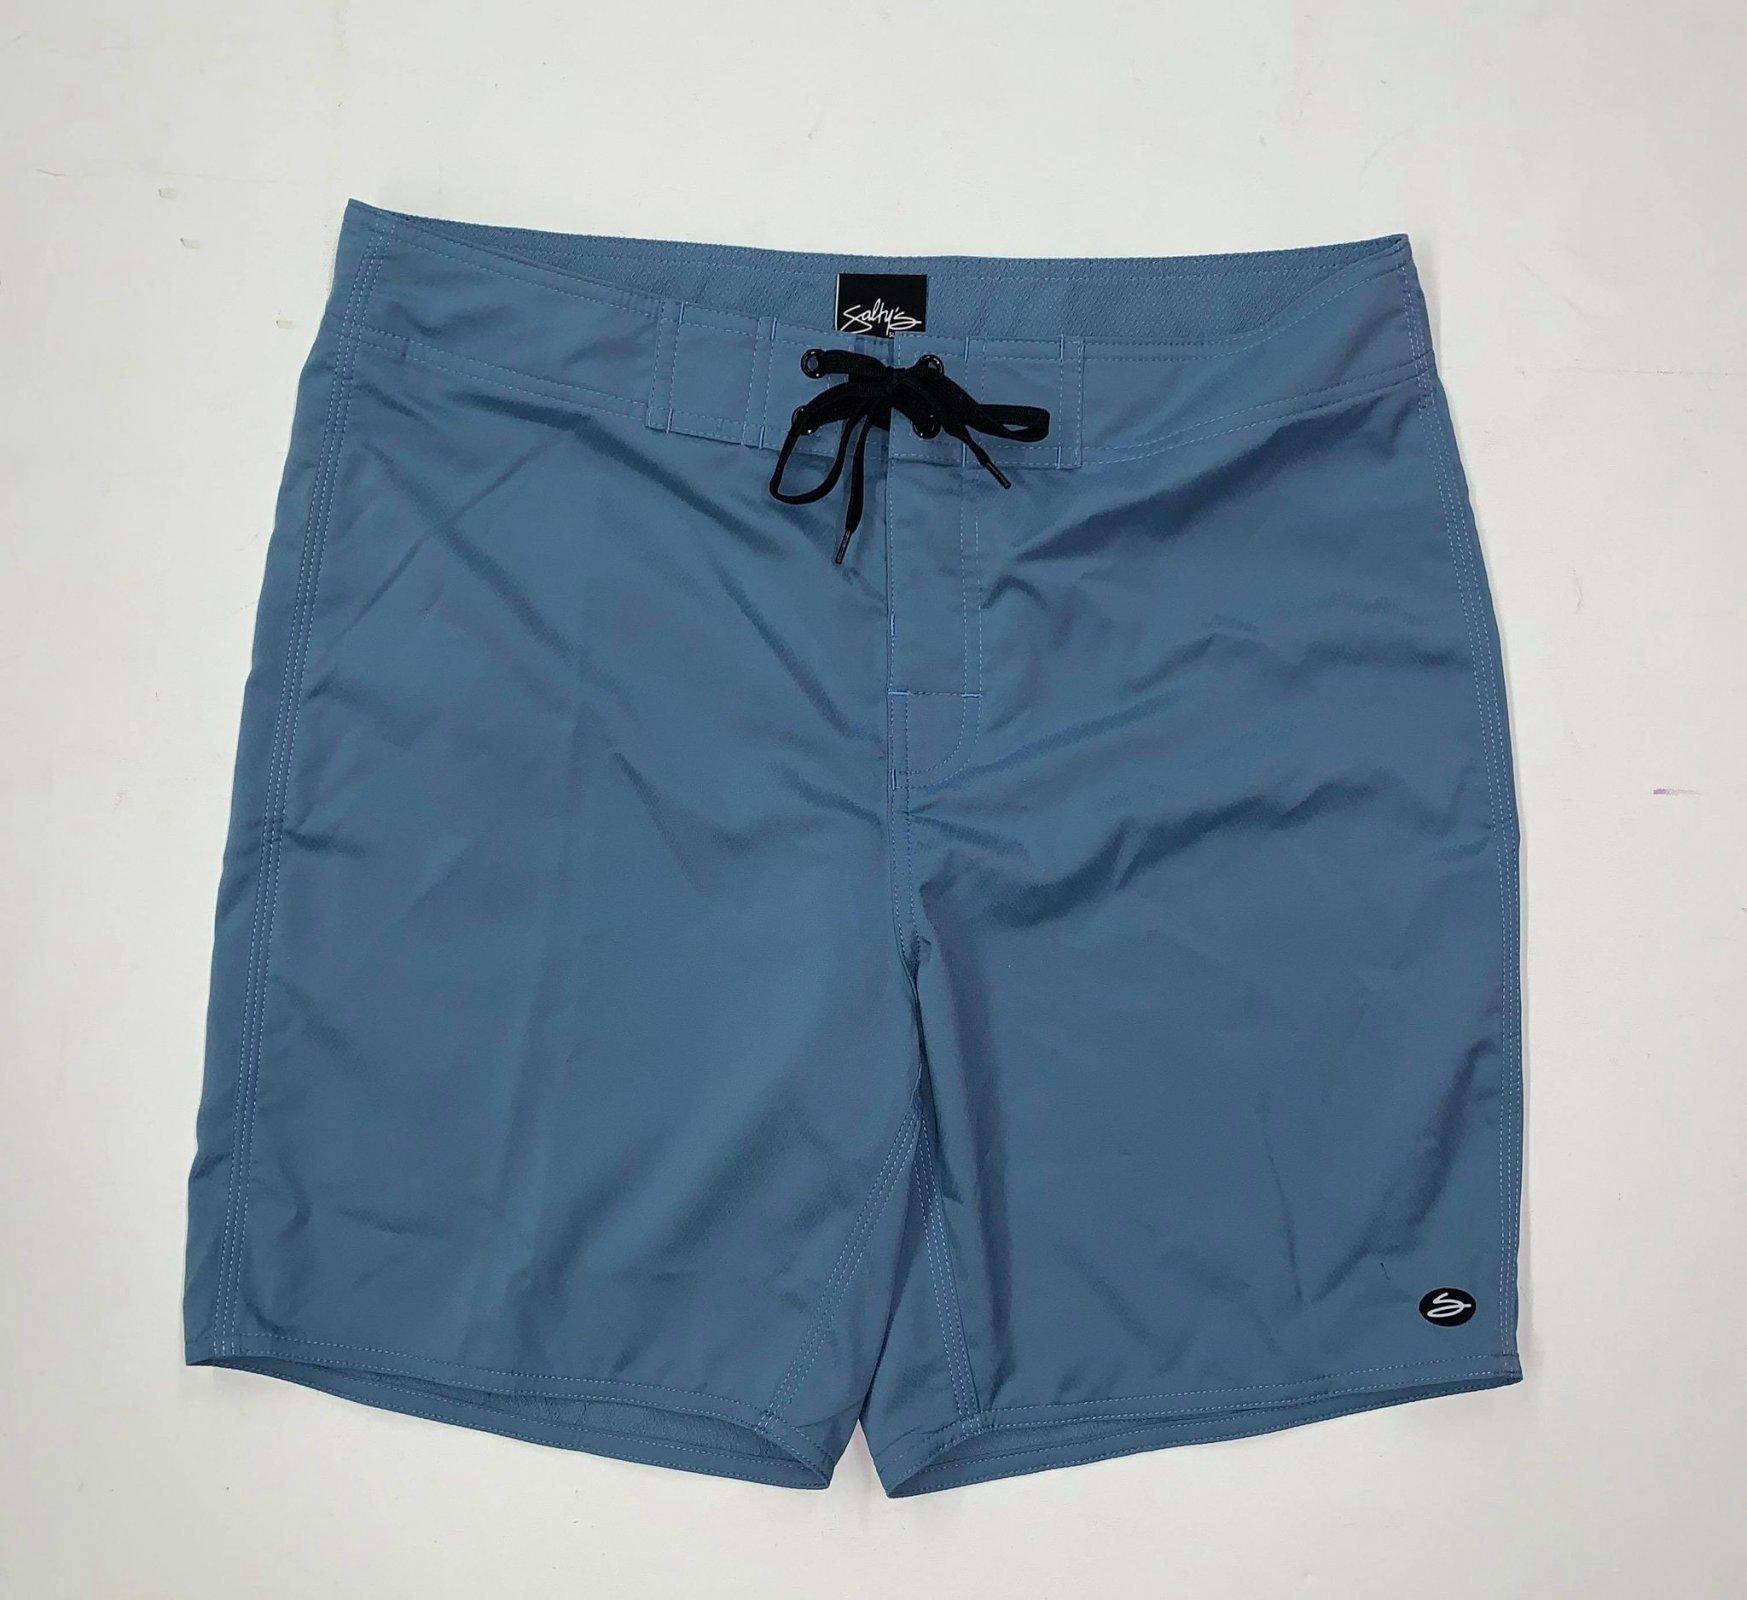 Salty's Brand Men's Diamond Dave II Boardshorts - Blue Heaven